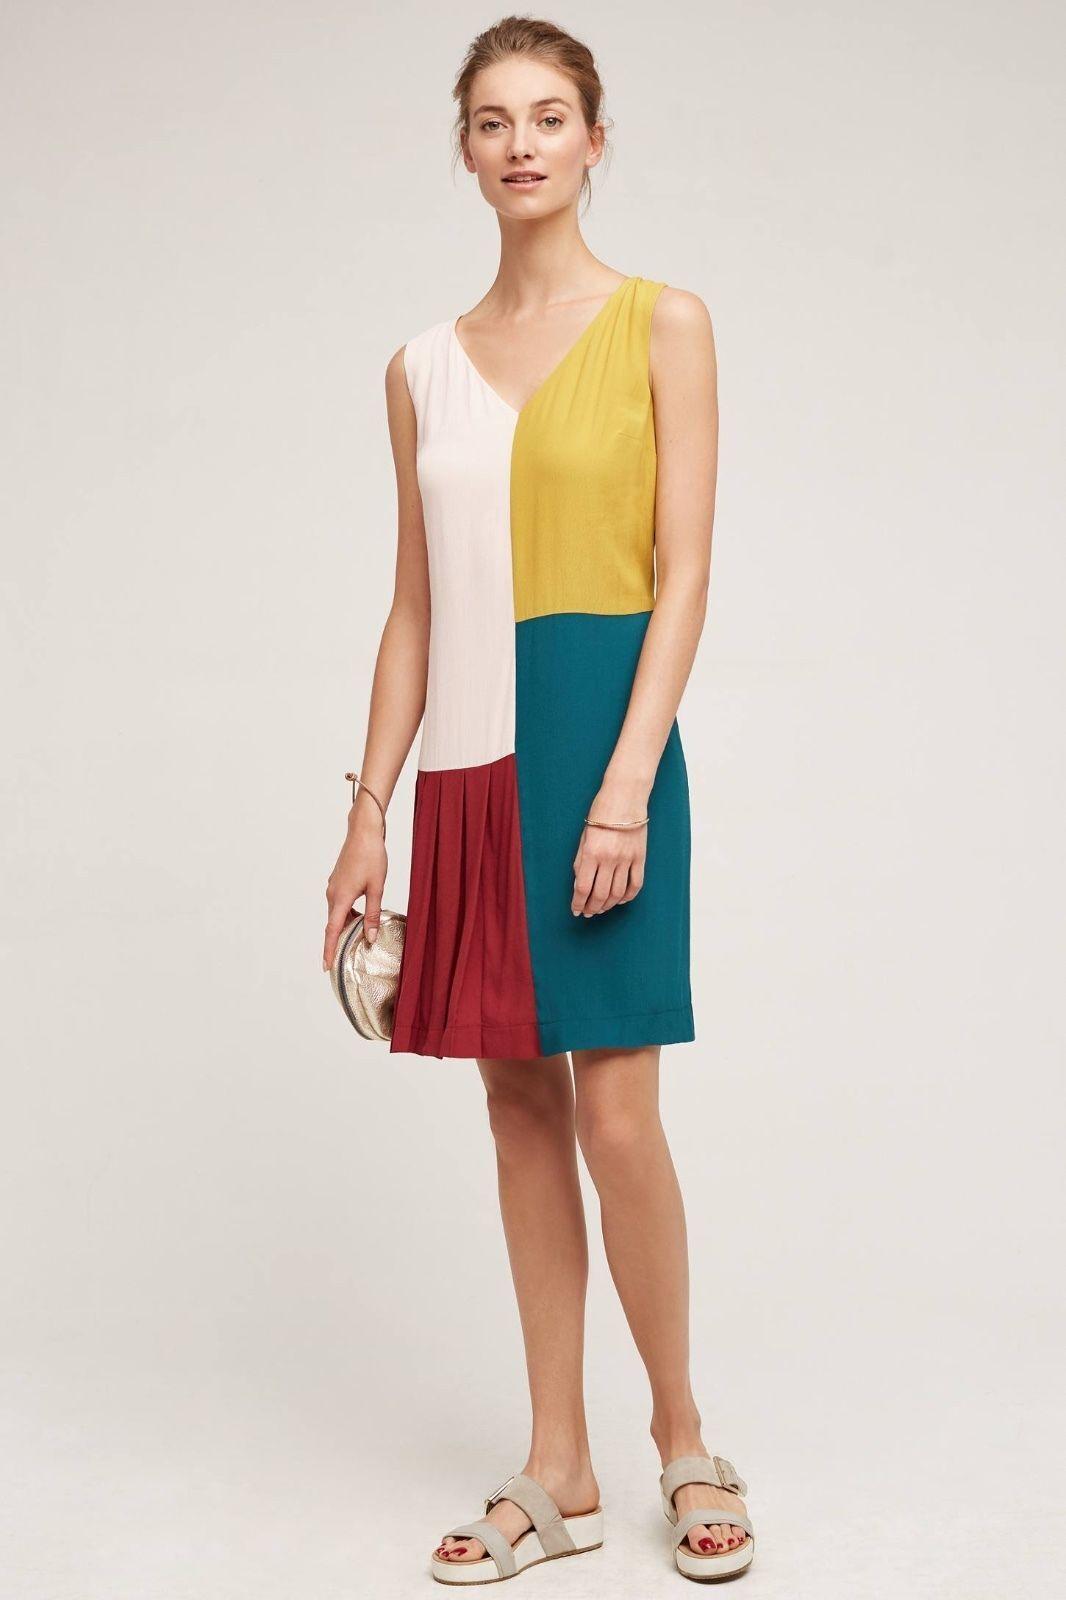 Anthropologie Dress 4 Shift Asymmetric Farbeblock Teal V-neck Pleated Sleeveless